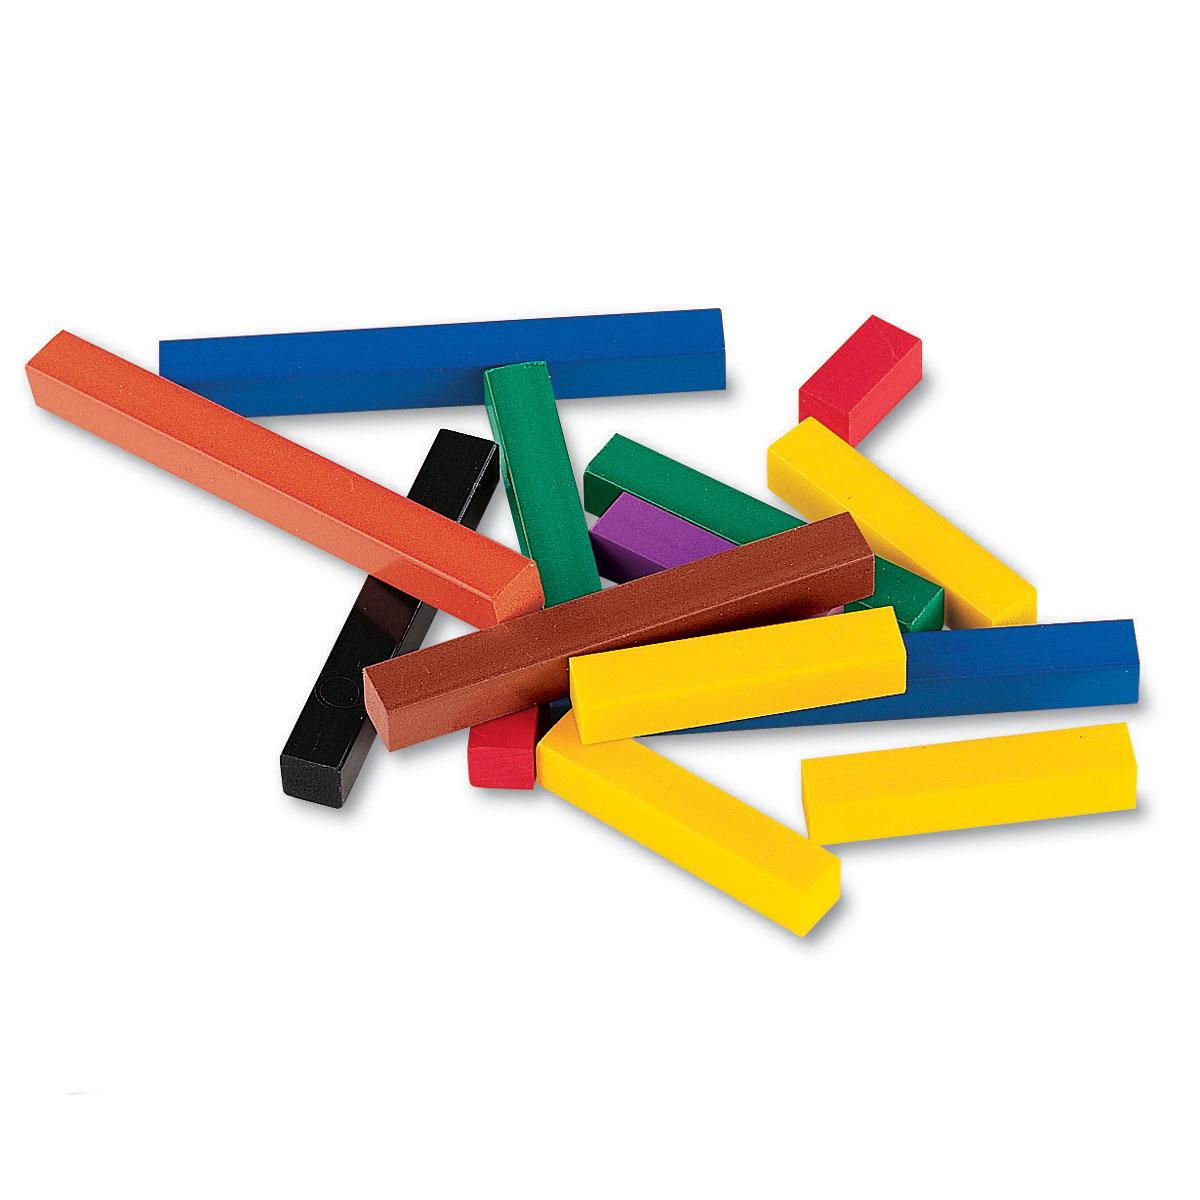 Plastic Cuisenaire Rods Class Multi Pack